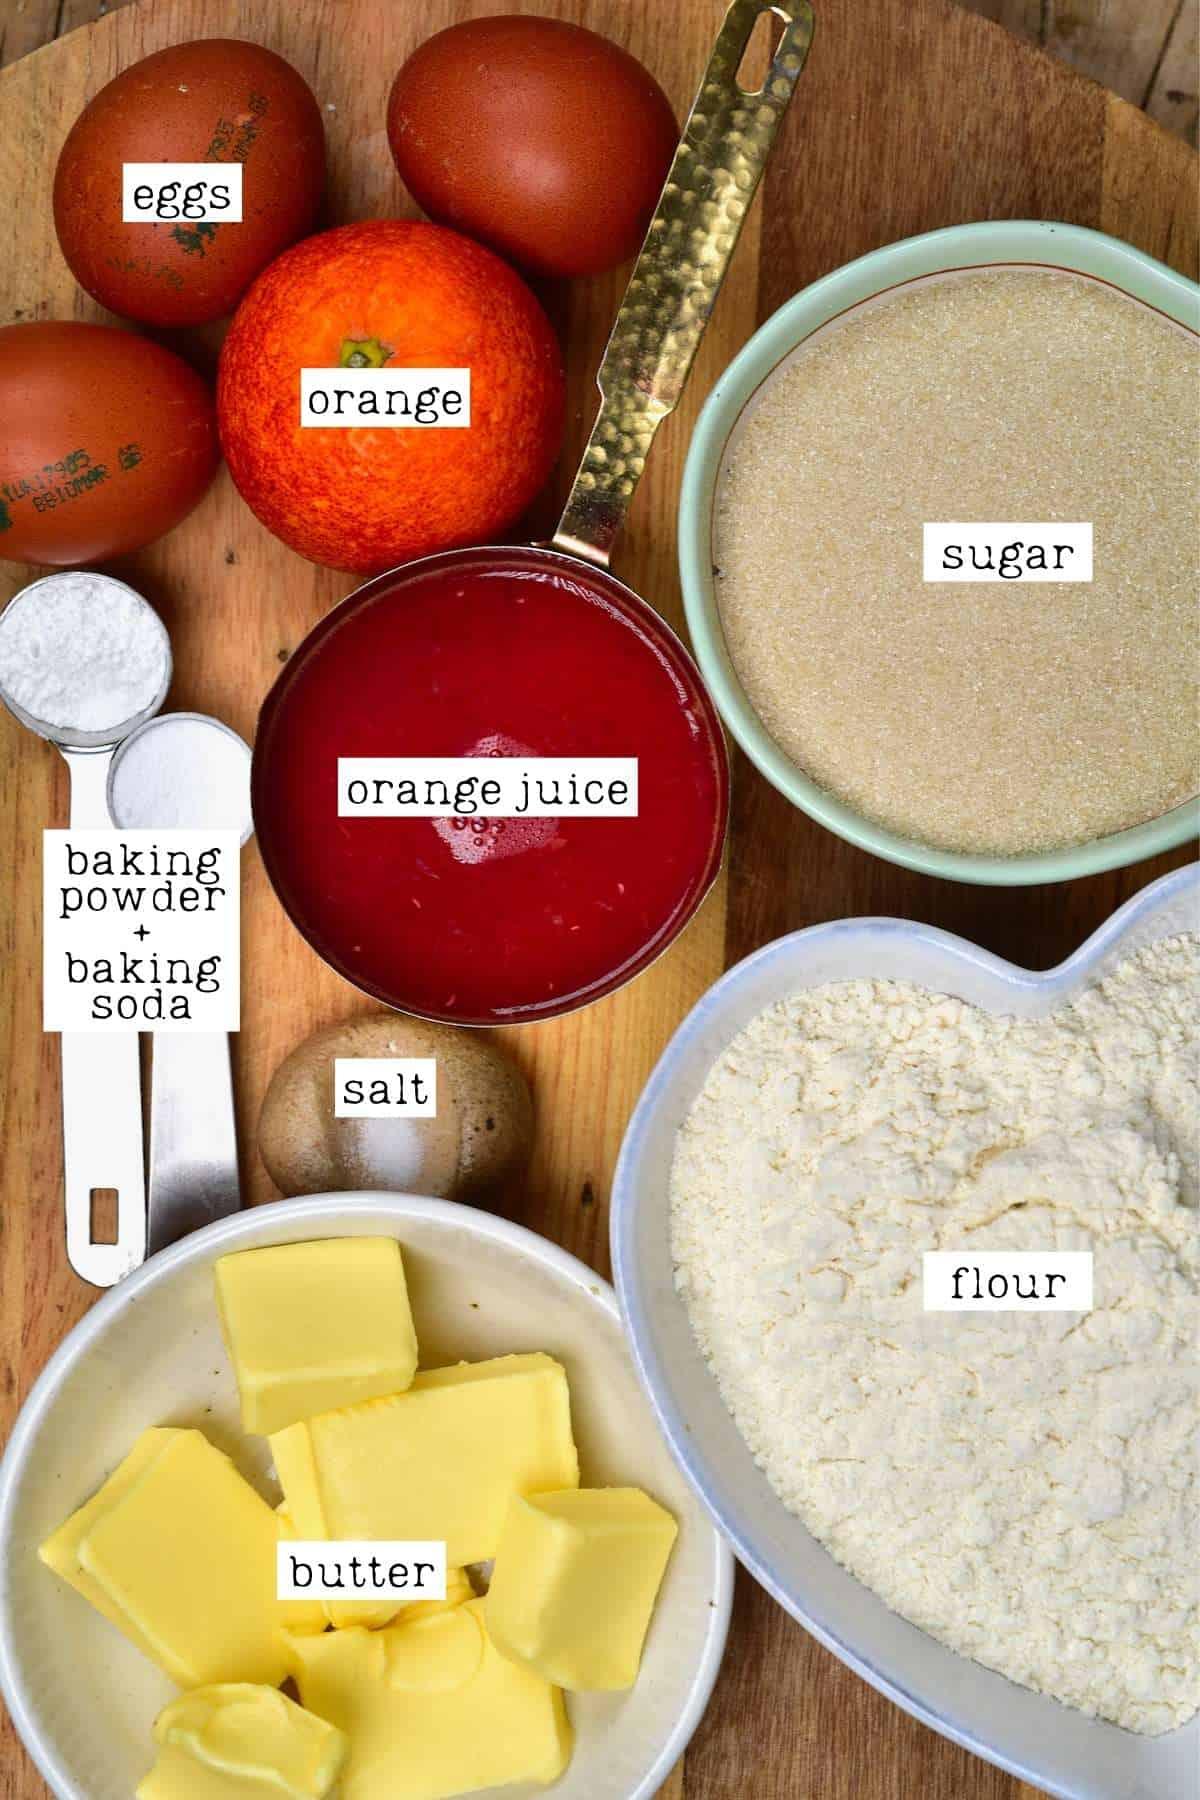 Ingredients for orange cake